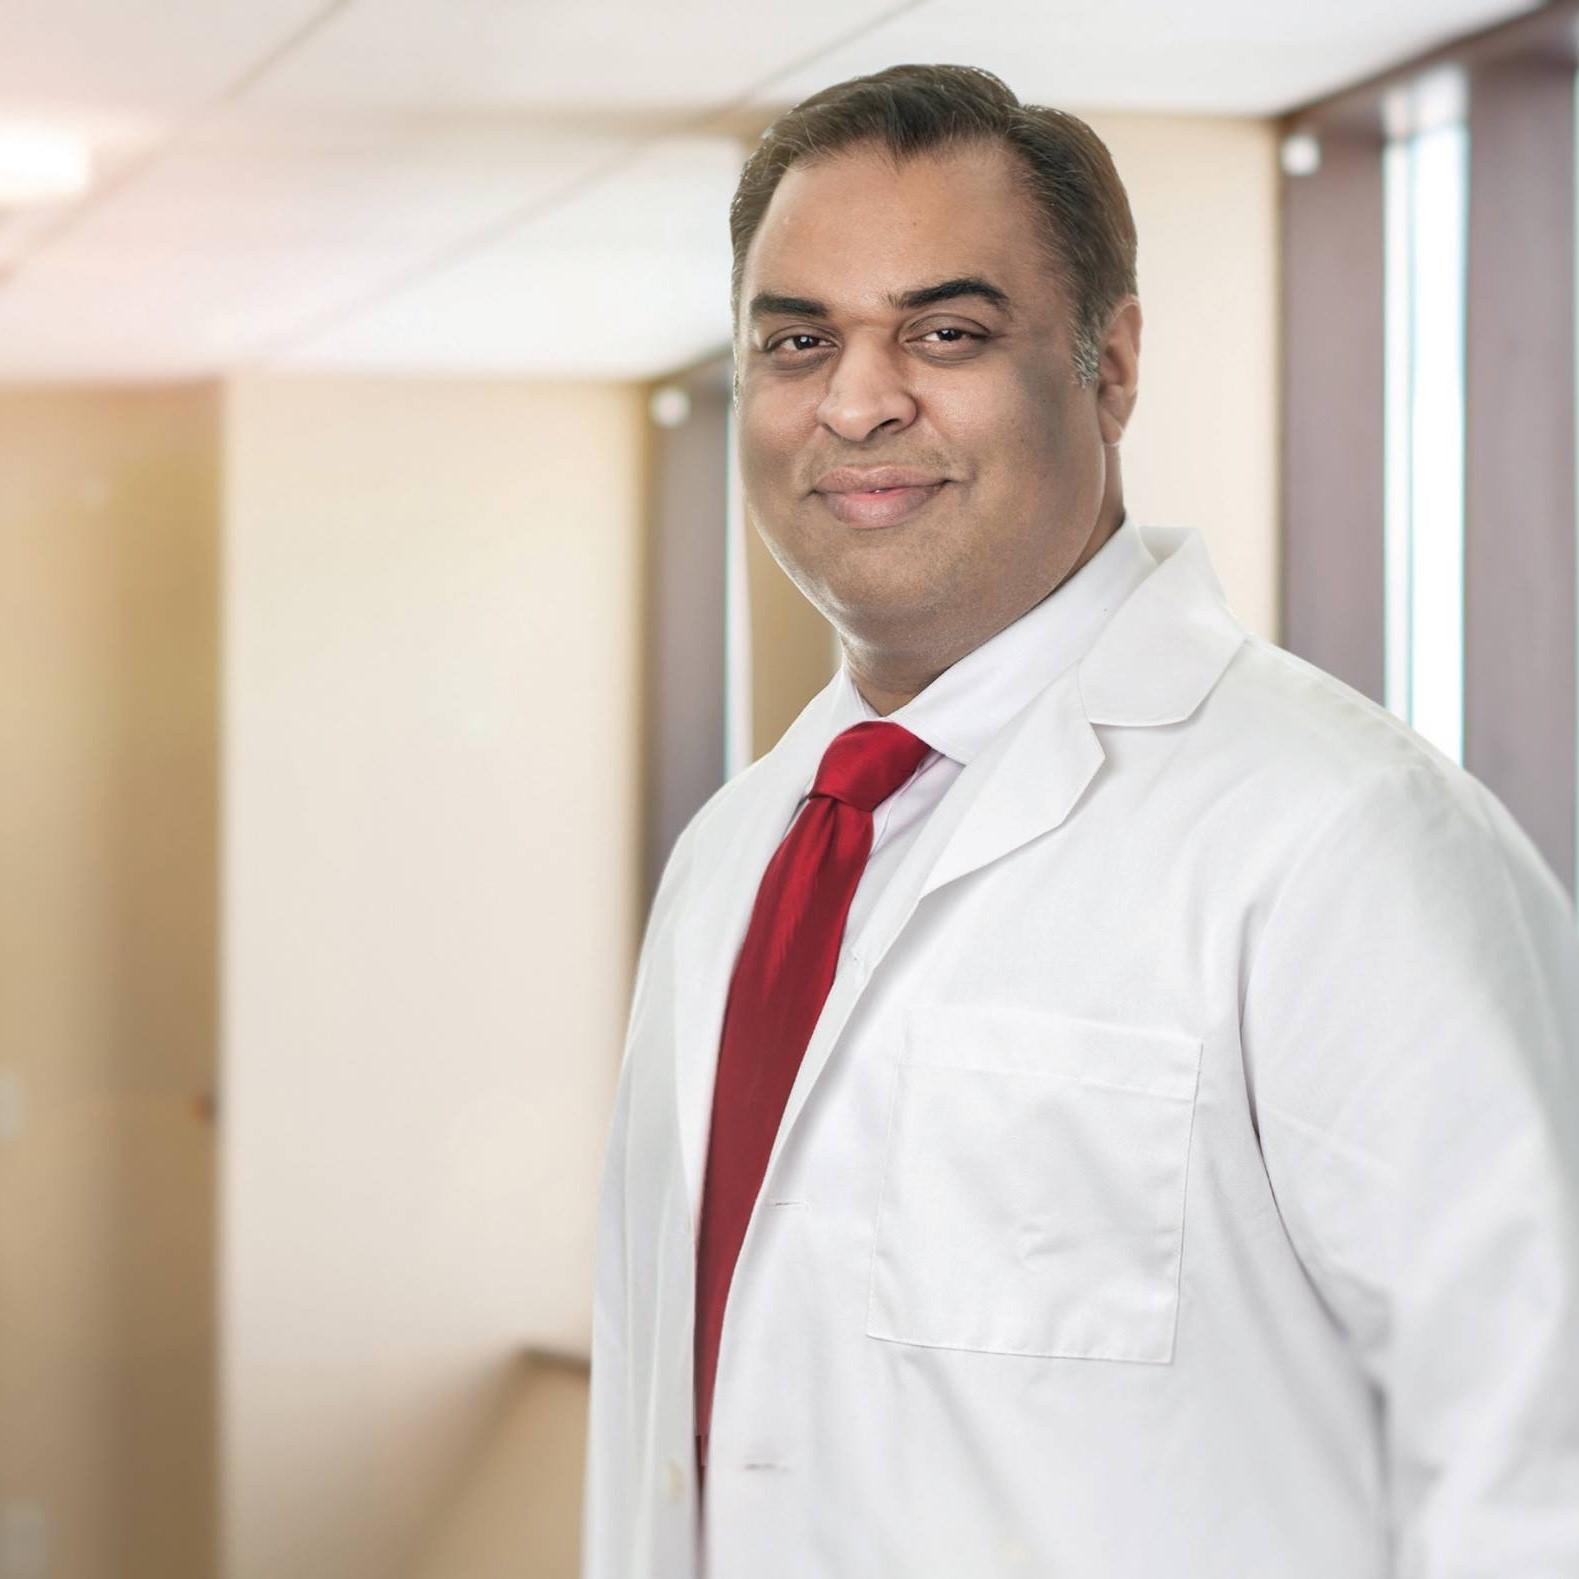 Anil Yallapragada, MD